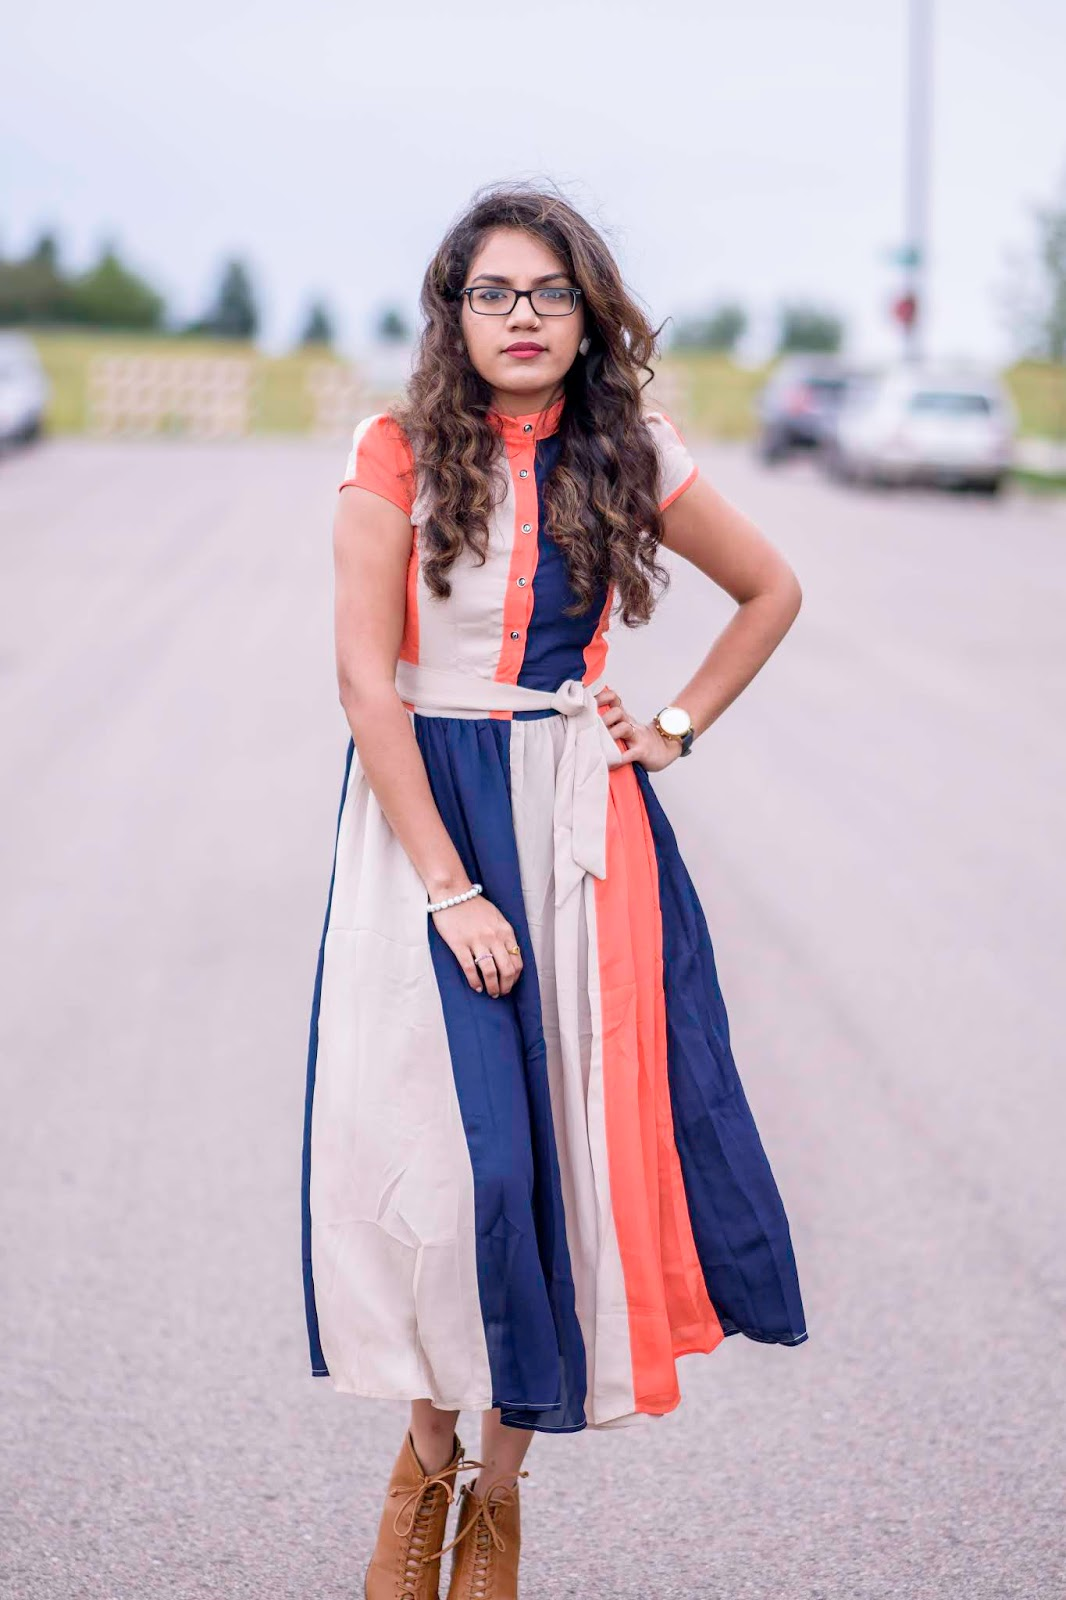 She In Review; Prasanthi Kadiyala; Aim for Glam; South Indian; Fashion Blogger; South India Fashion Blogger